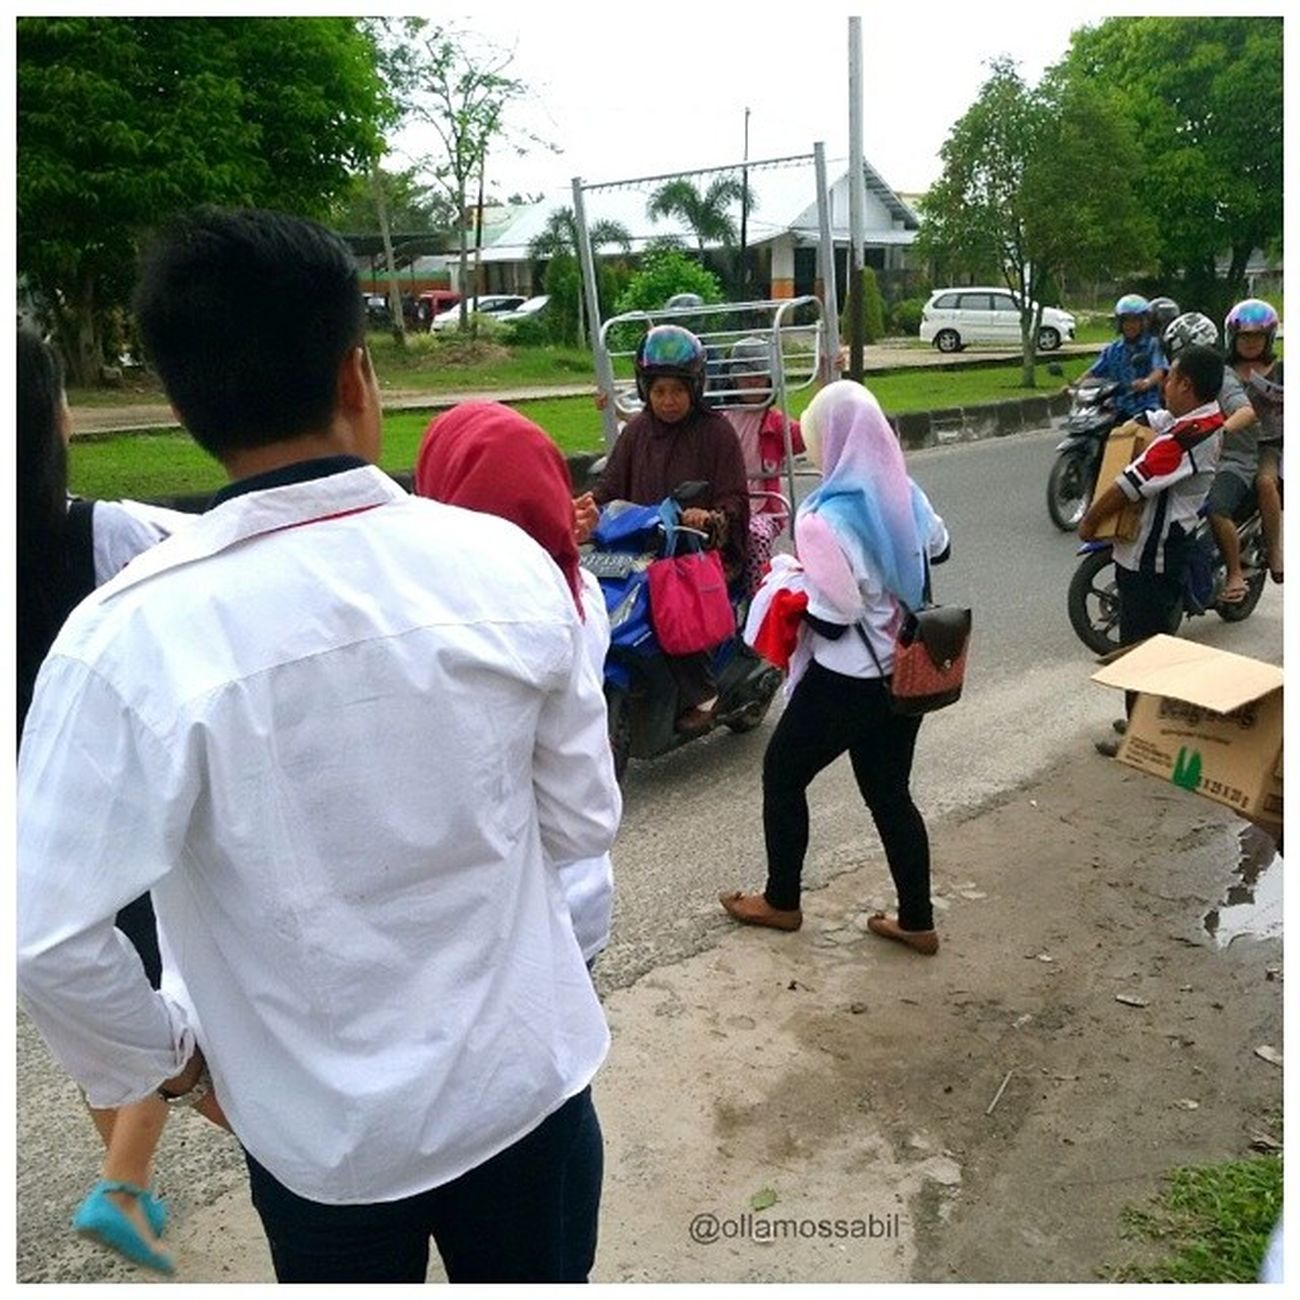 Relawan Muda Prabowo-Hatta, TIDAR, Laskar Merah-Putih Melakukan kegiatan positif seperti pembagian kaos, makanan kecil, susu, majalah Dan hal-hal berguna lainnya … tentu kegiatan ini sebelumnya sudah berizin dan sesuai peraturan yang ada … … tanpa mengganggu pihak lain, tanpa membuat keributan dan keresahan warga sekitar … Bagi teman-teman Palangkaraya yang mau bergabung, silahkan langsung pm ya, sangat amat dibuka kesempatan untuk kamu untuk bergabung dengan kami ^_^ … Salam Indonesia Raya ❤ … Prabowo Prabowohatta INDONESIA Palangkaraya merahputih laskarmerahputih tidar kalimantantengah relawan relawanmudaprabowohatta positif baktisosial susu snack majalah RI1 prabowountukRI1 molome